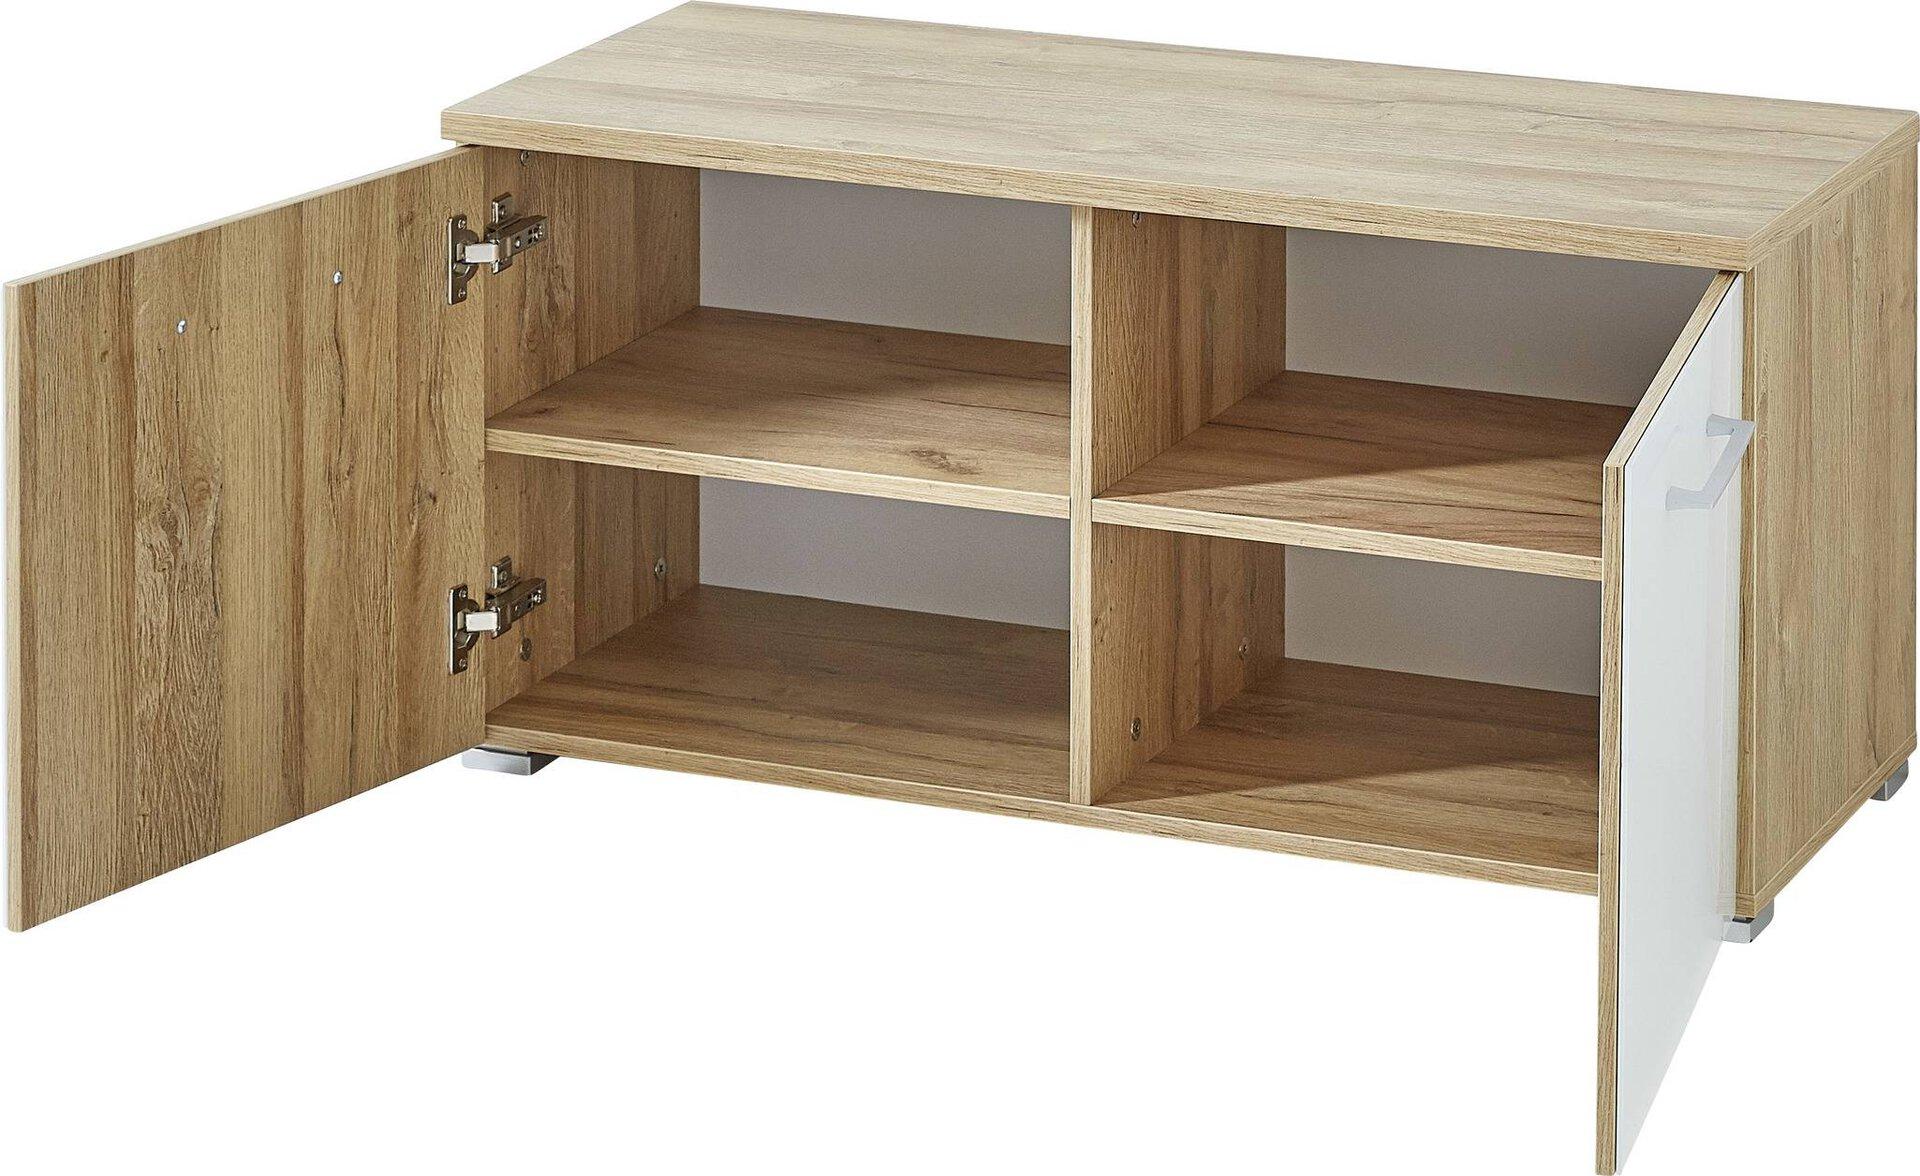 Garderobenbank SINTARA Vito Holzwerkstoff mehrfarbig 47 x 40 x 97 cm